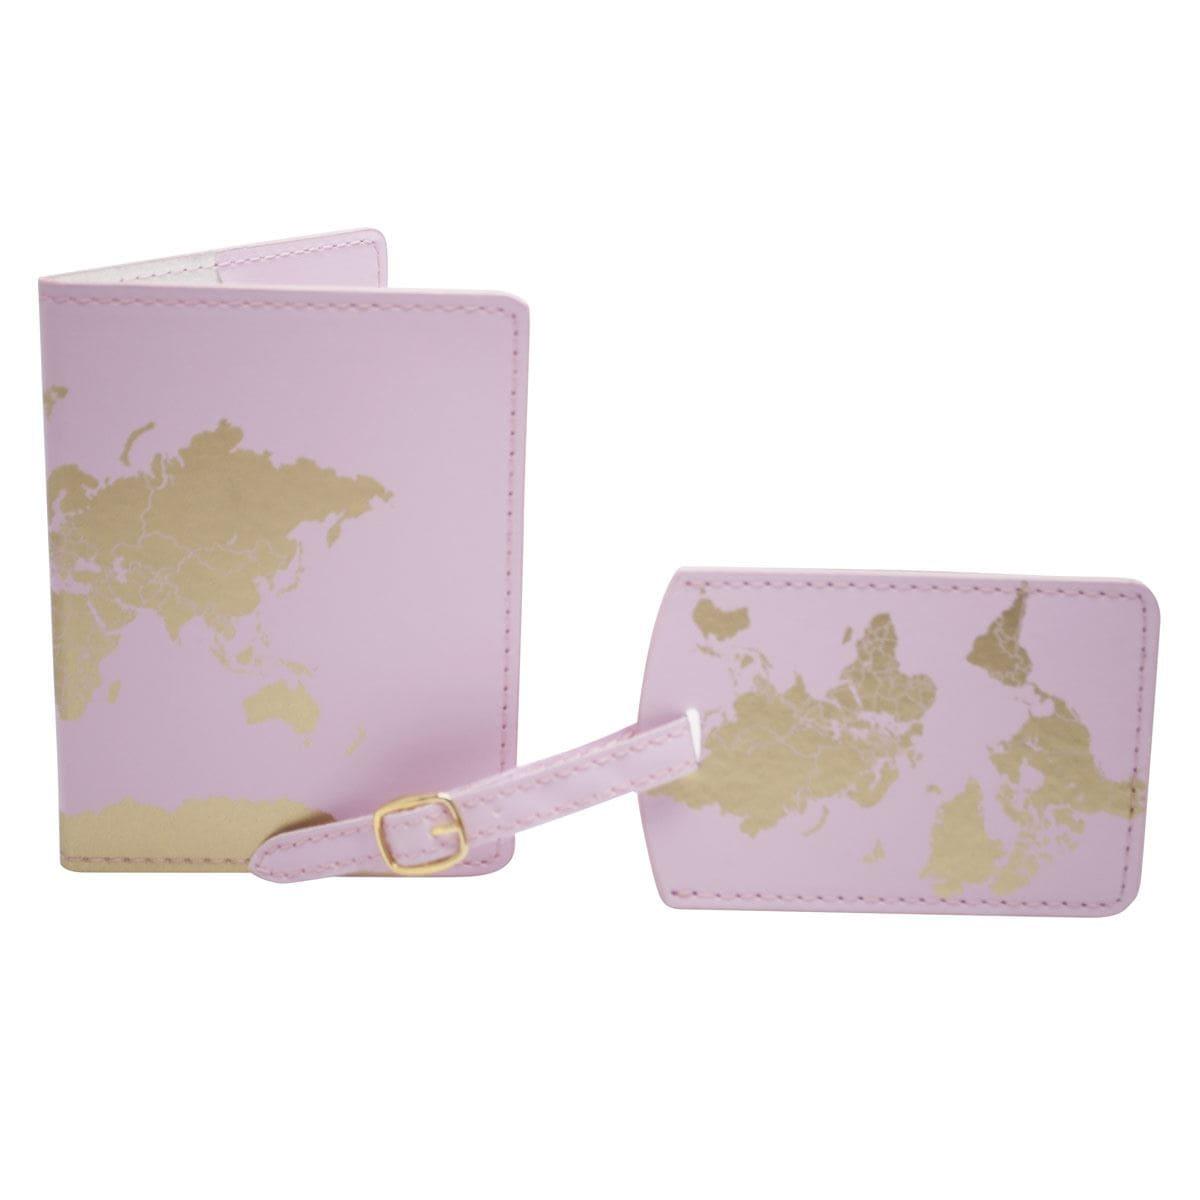 Set pasaporte y etiqueta de viaje rosa Art Home